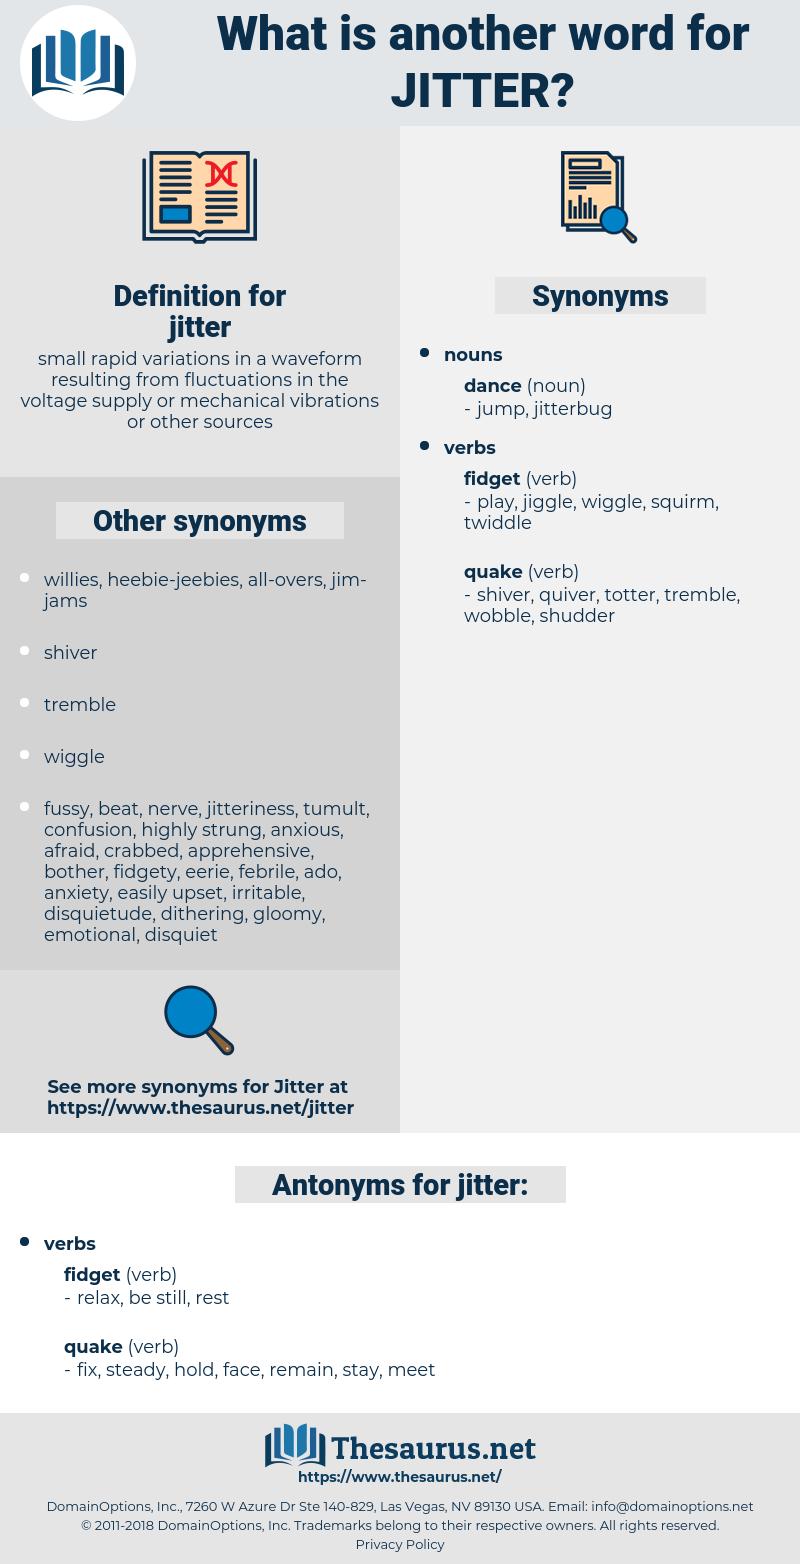 jitter, synonym jitter, another word for jitter, words like jitter, thesaurus jitter